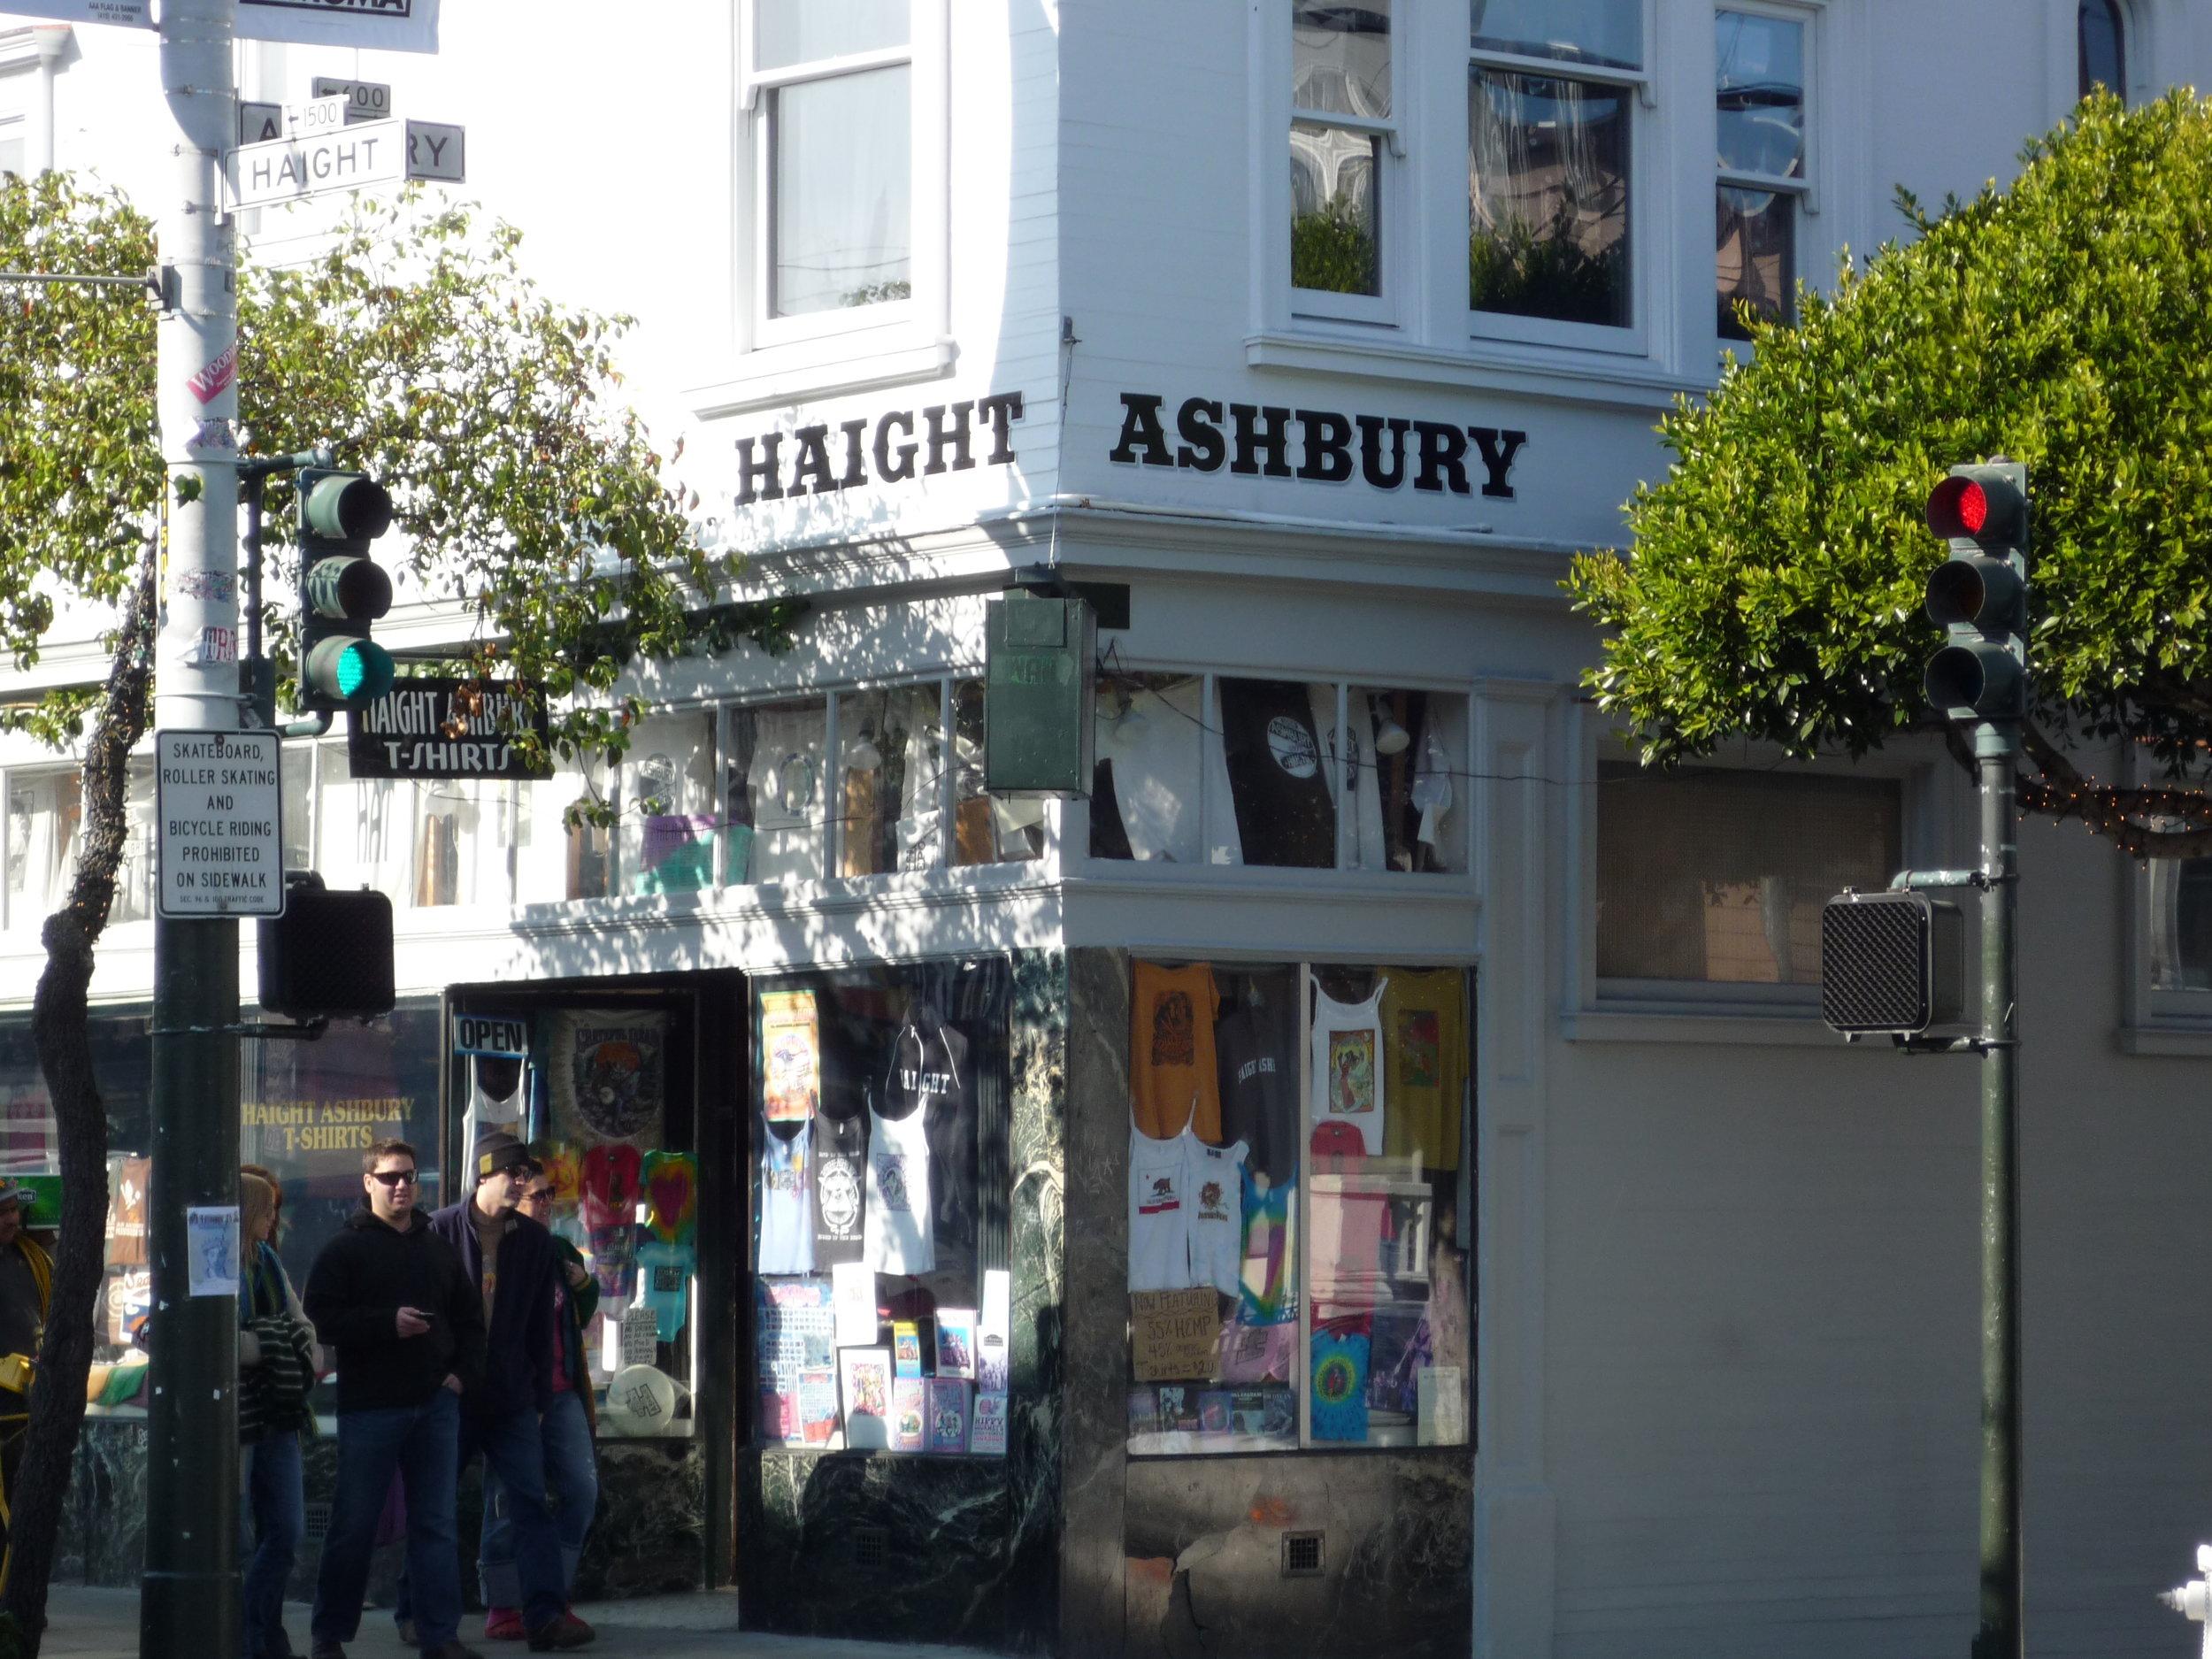 HAND-haight-ashbury-street-corner_4306546755_o.jpg